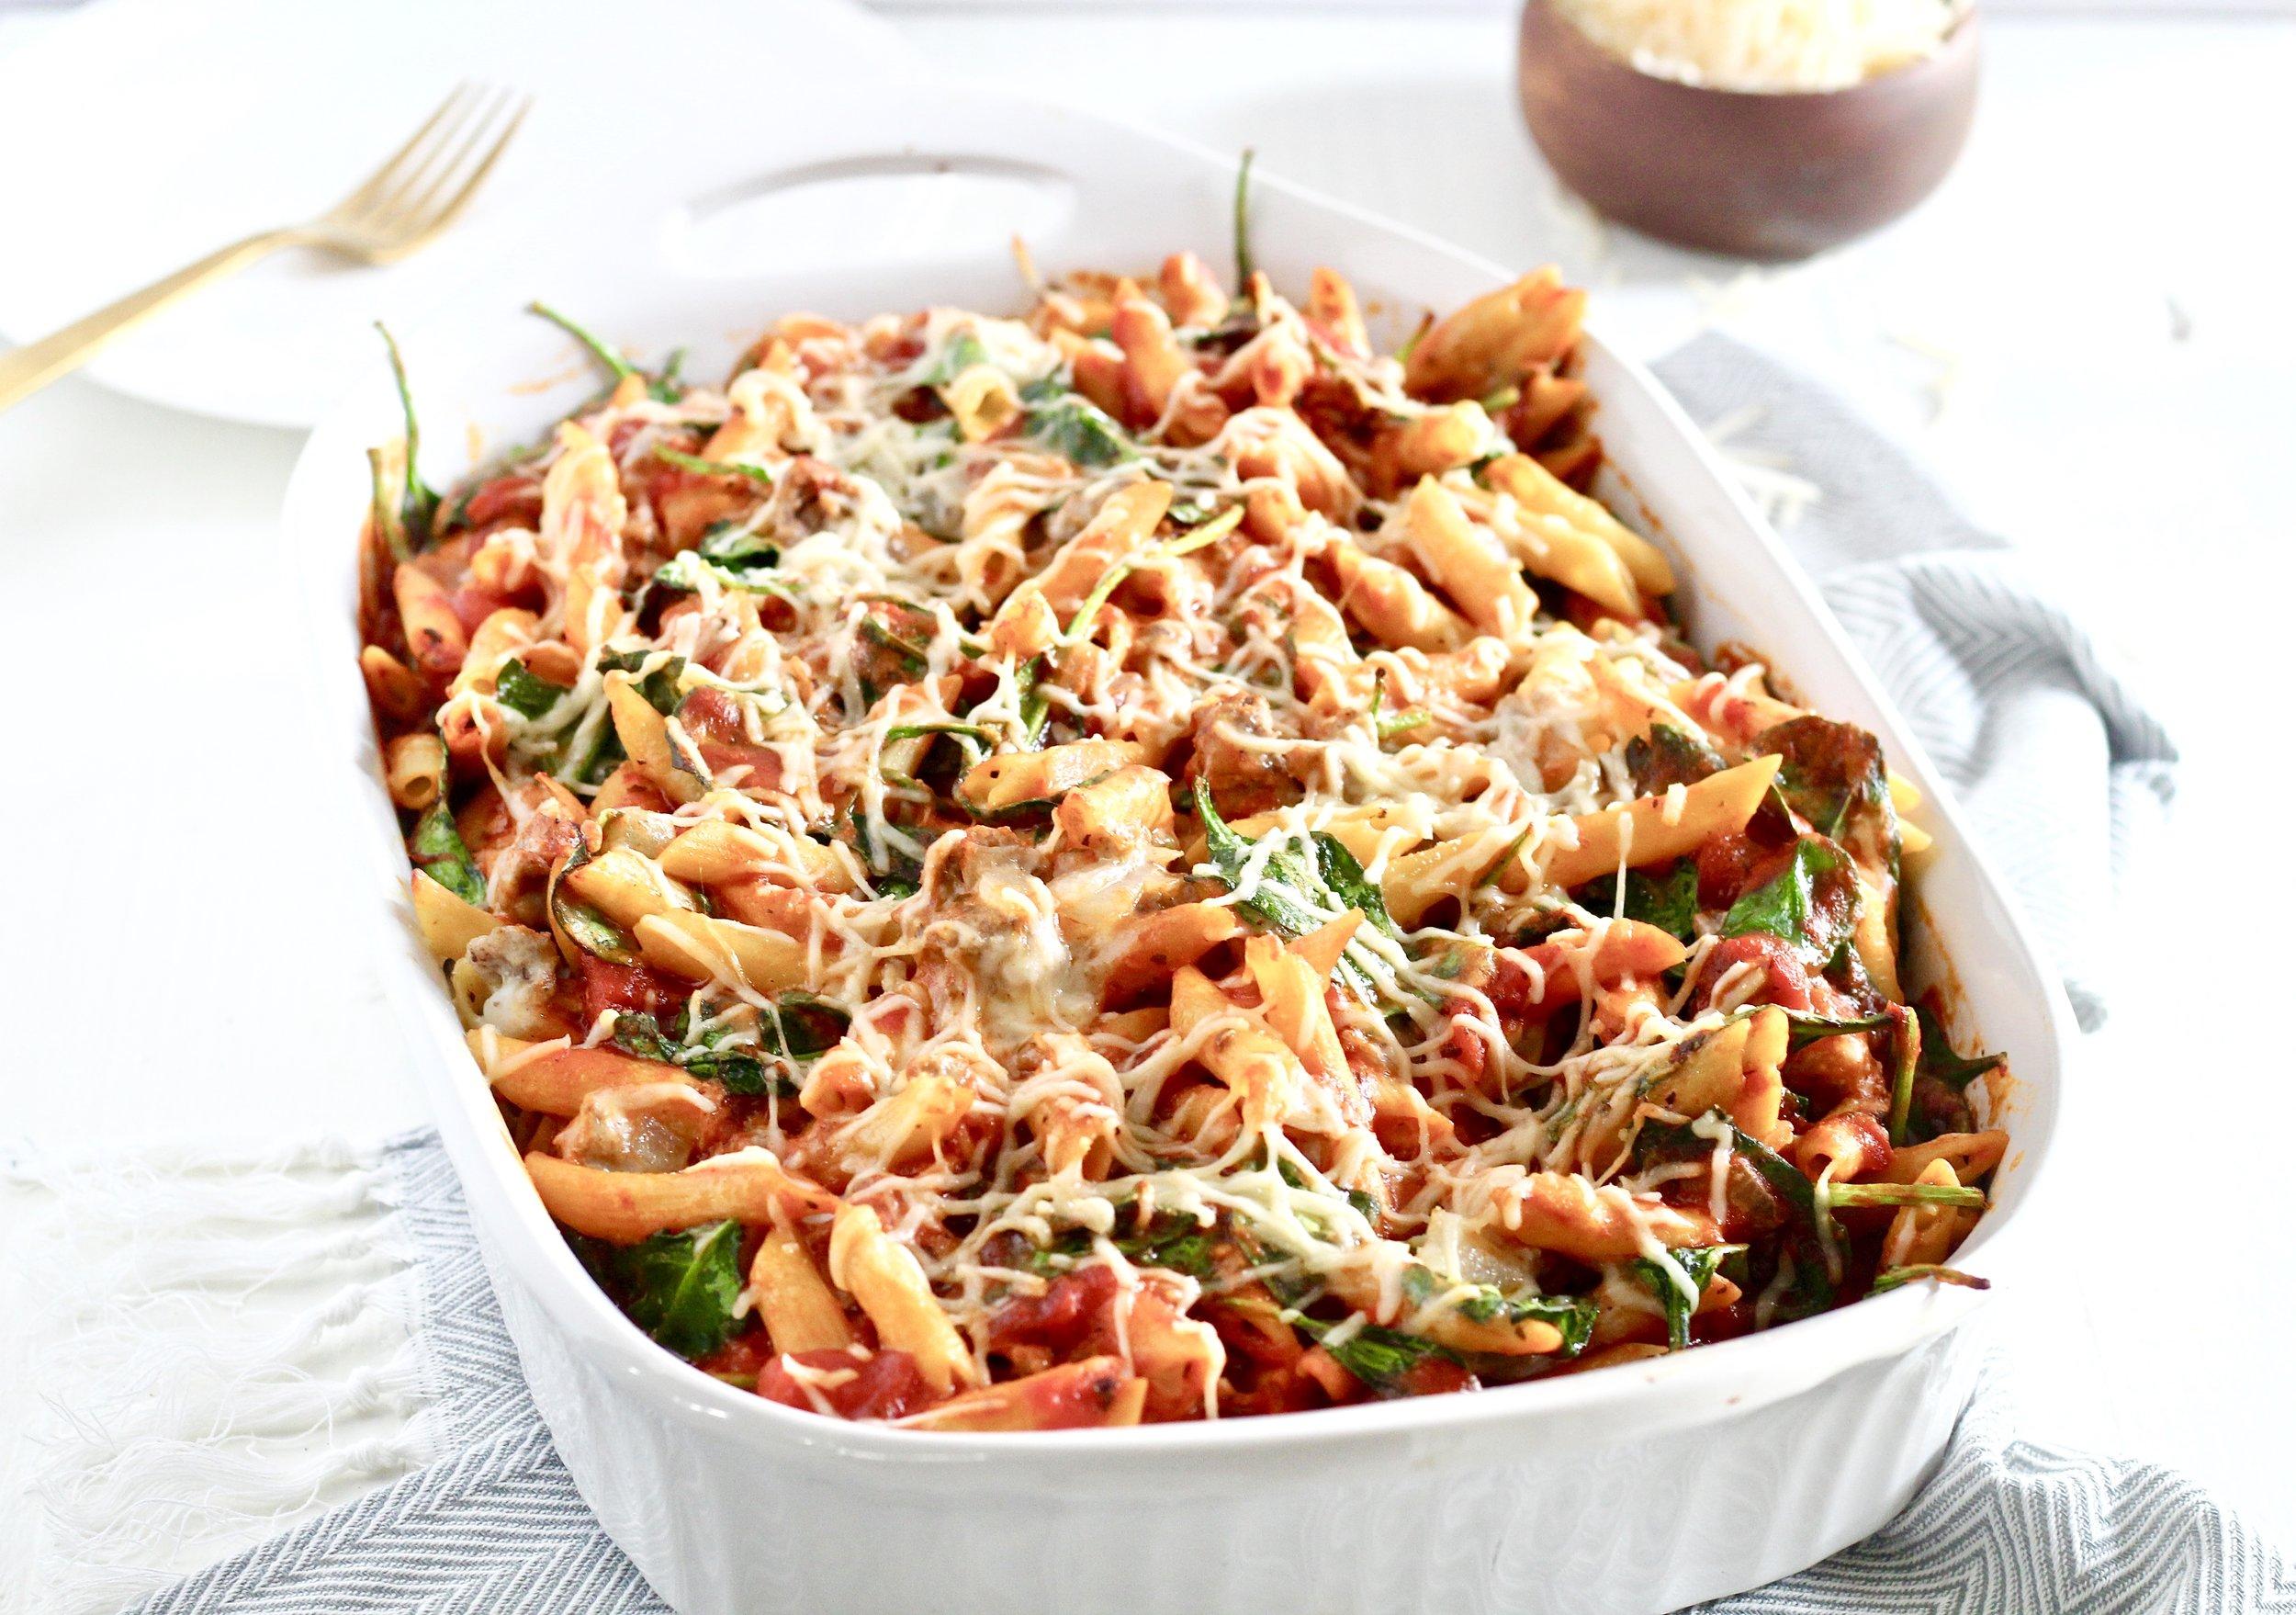 Cheesy Ground Lamb and Spinach Pasta Bake